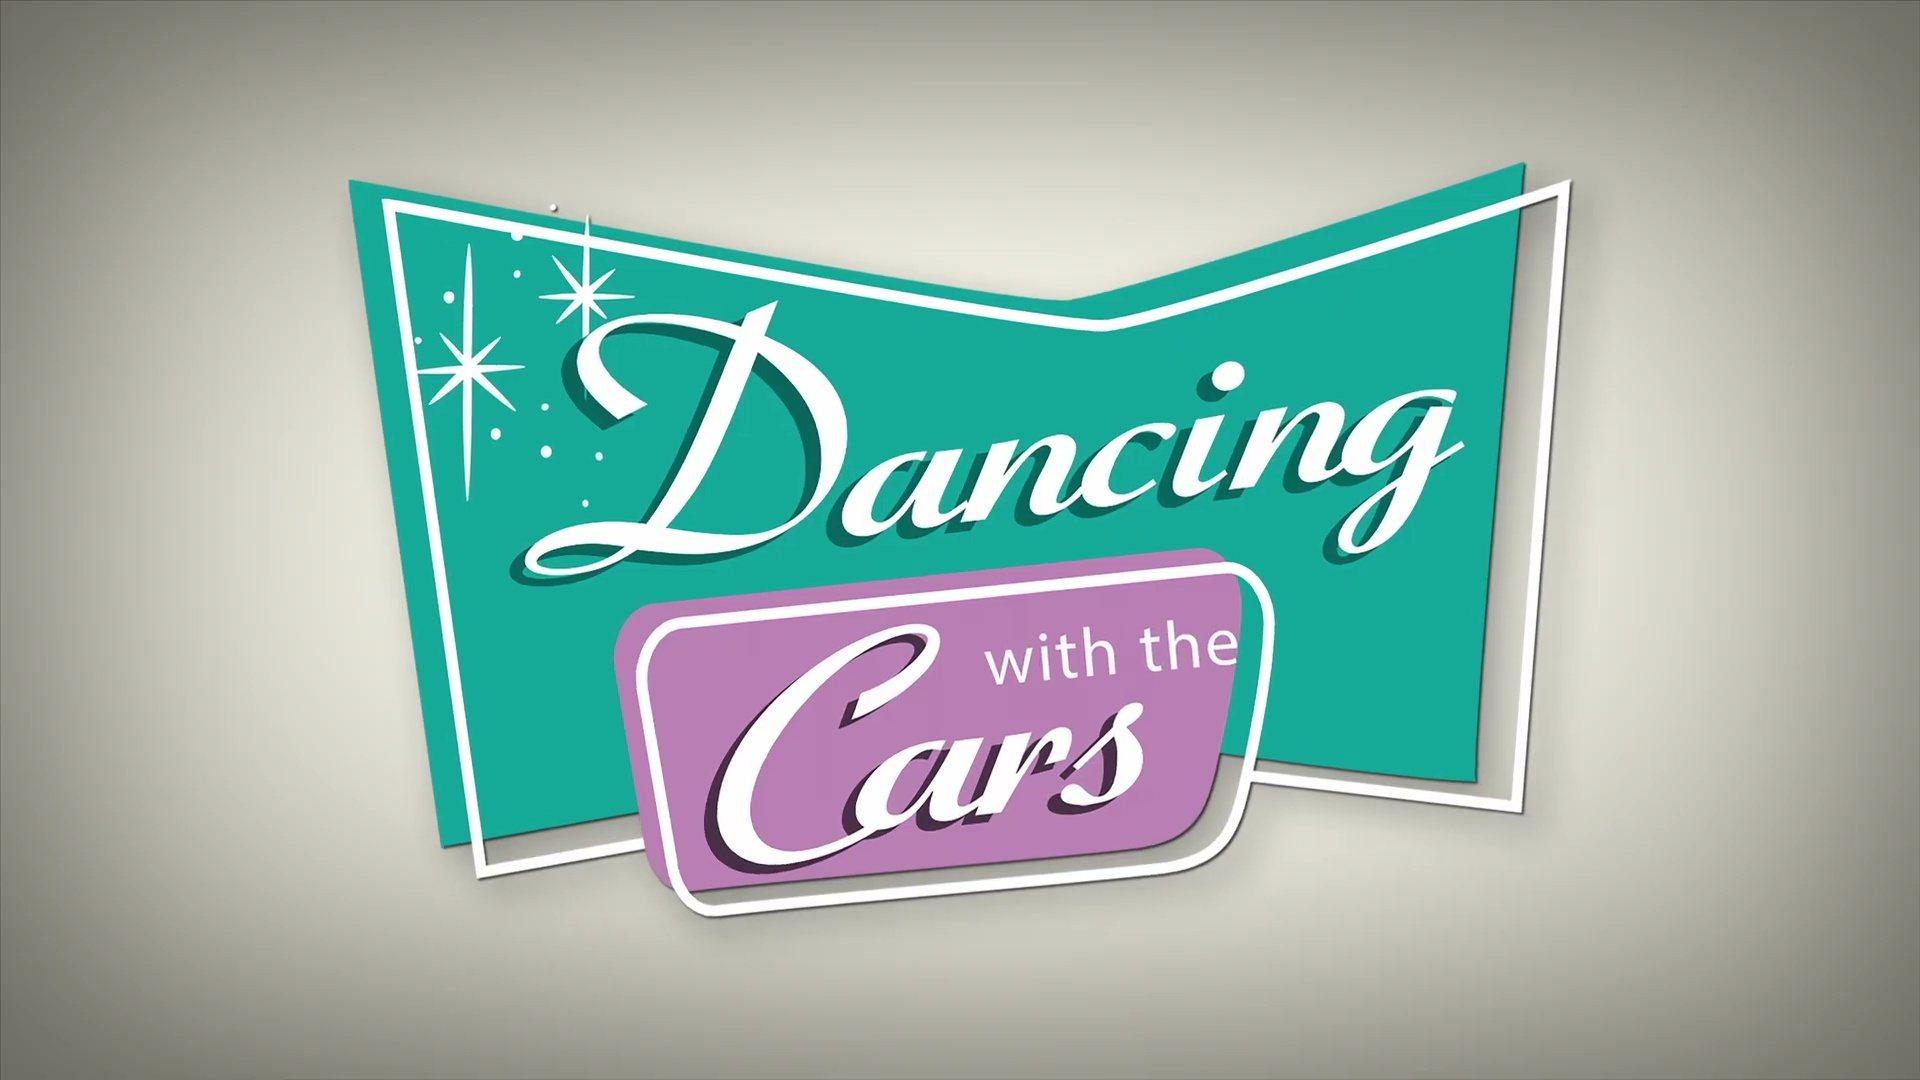 affiche poster dancing cars pixar popcorn disney